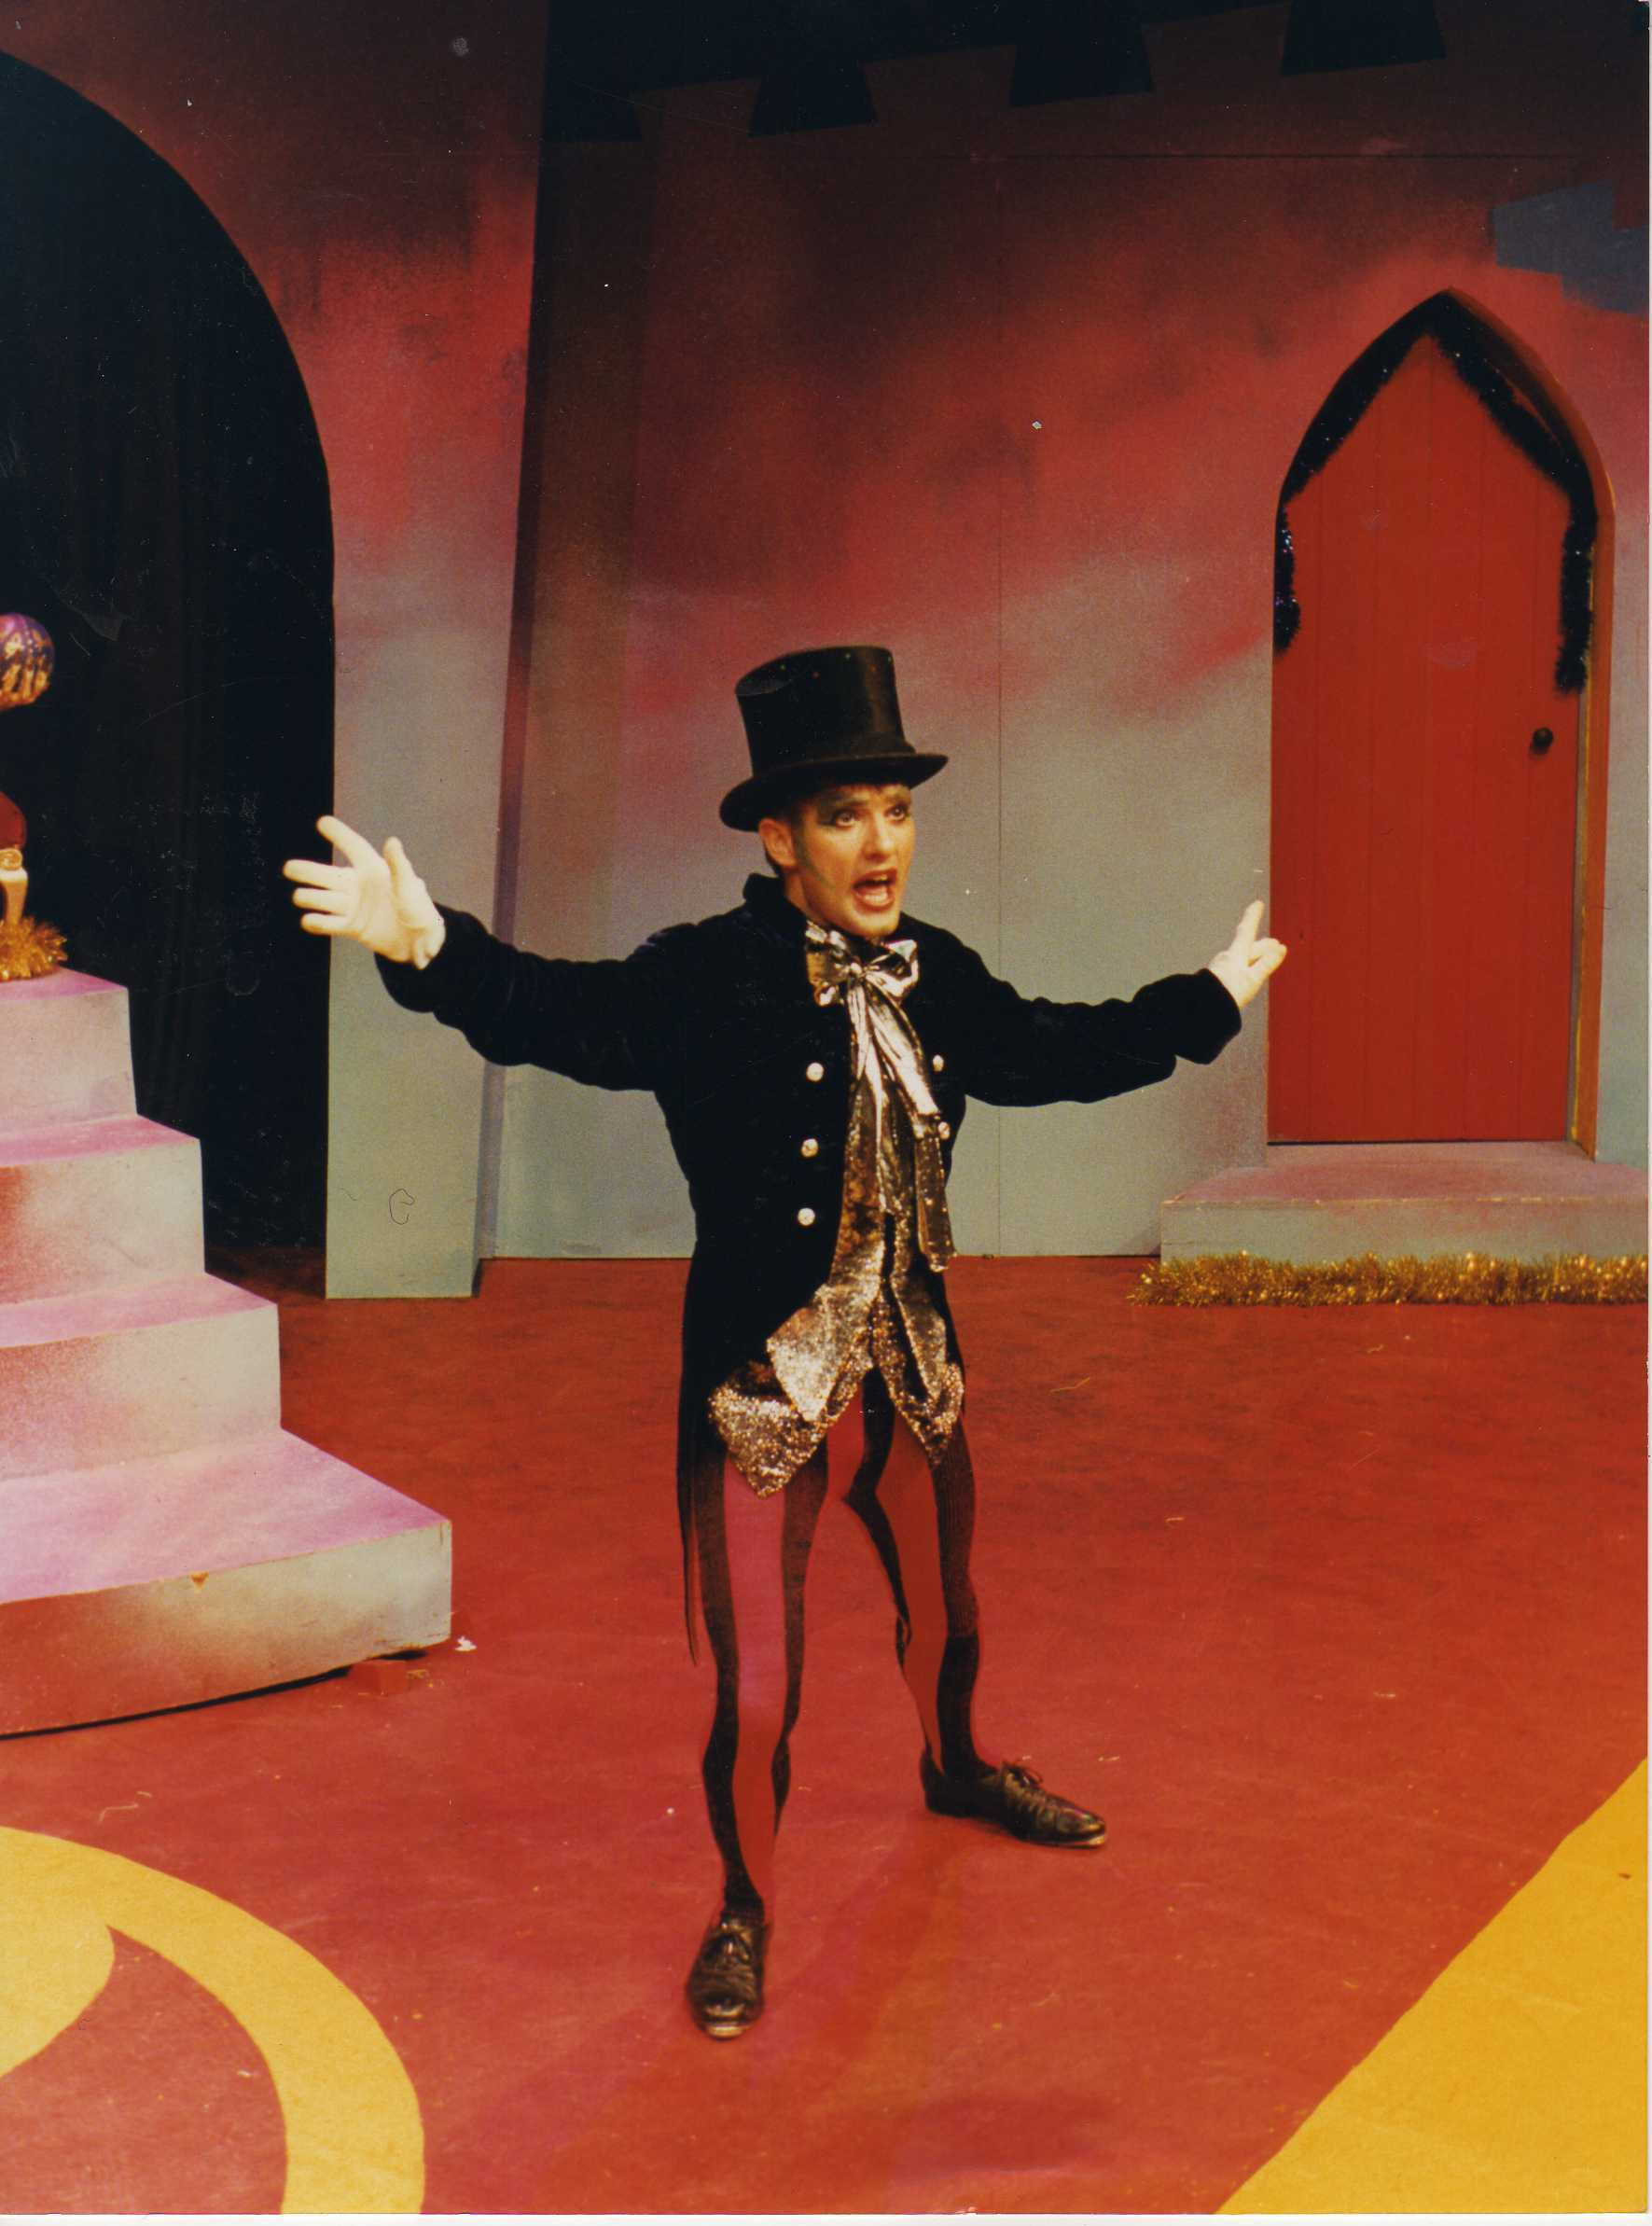 Rumpelstiltskin – The Christmas Musical Gallery Image